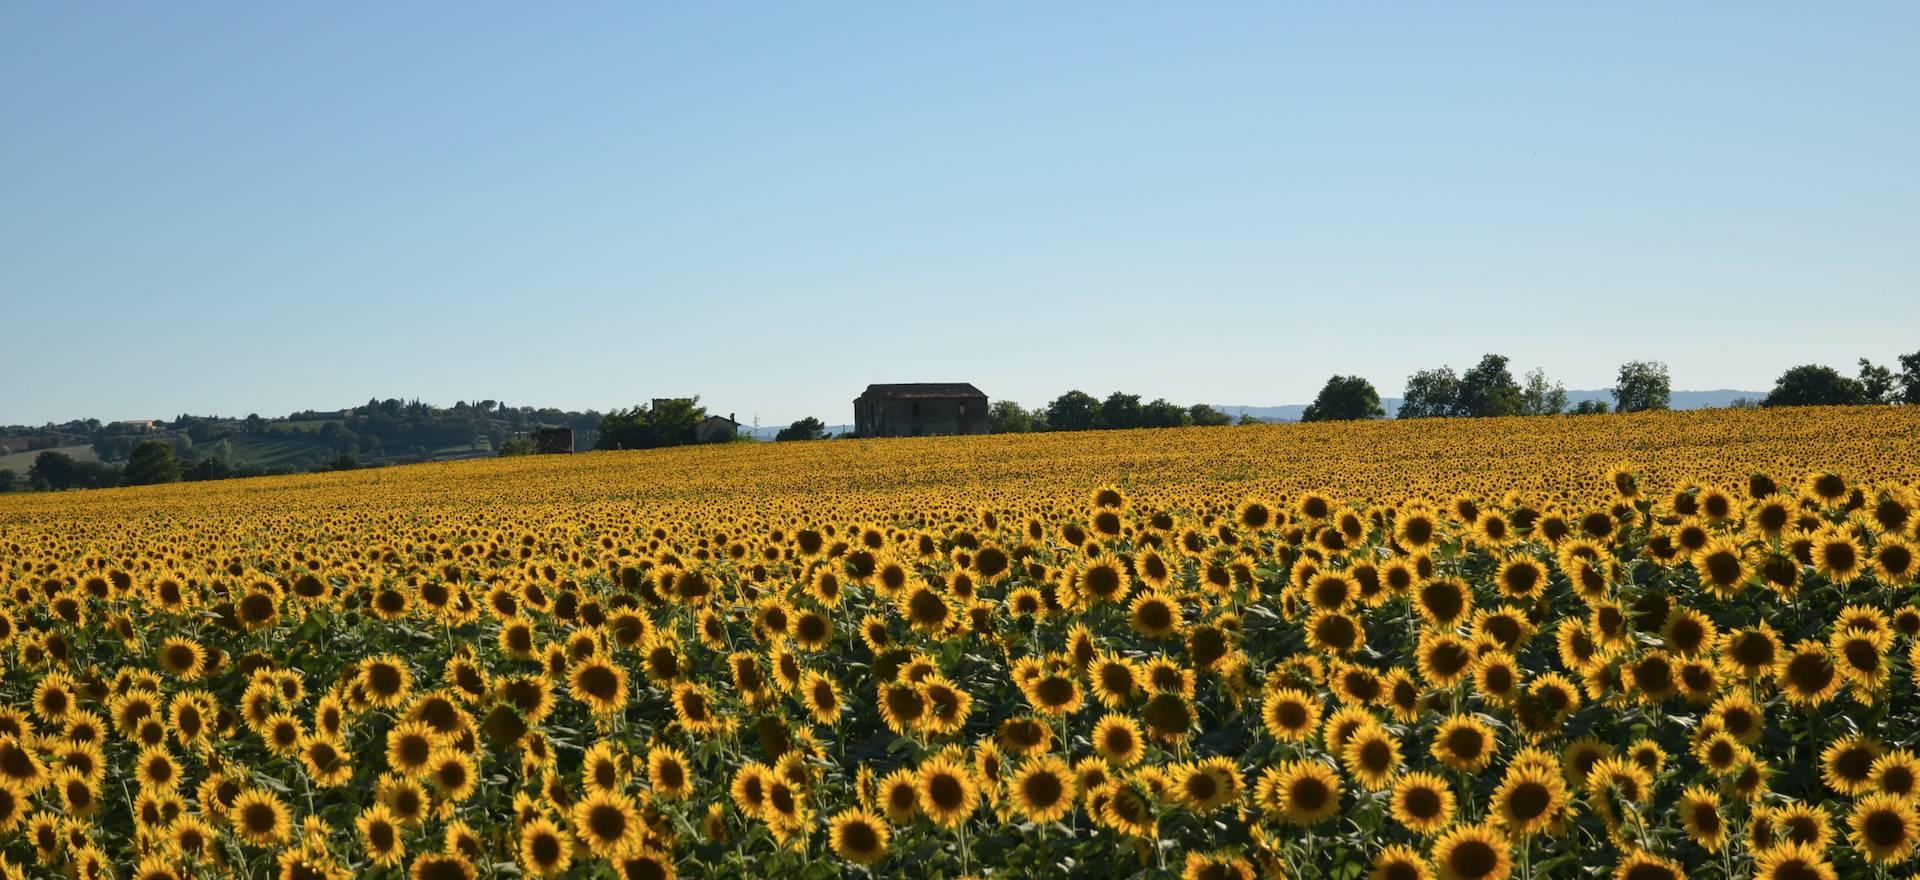 Agriturismo Toscana Agriturismo accogliente vicino a Cortona